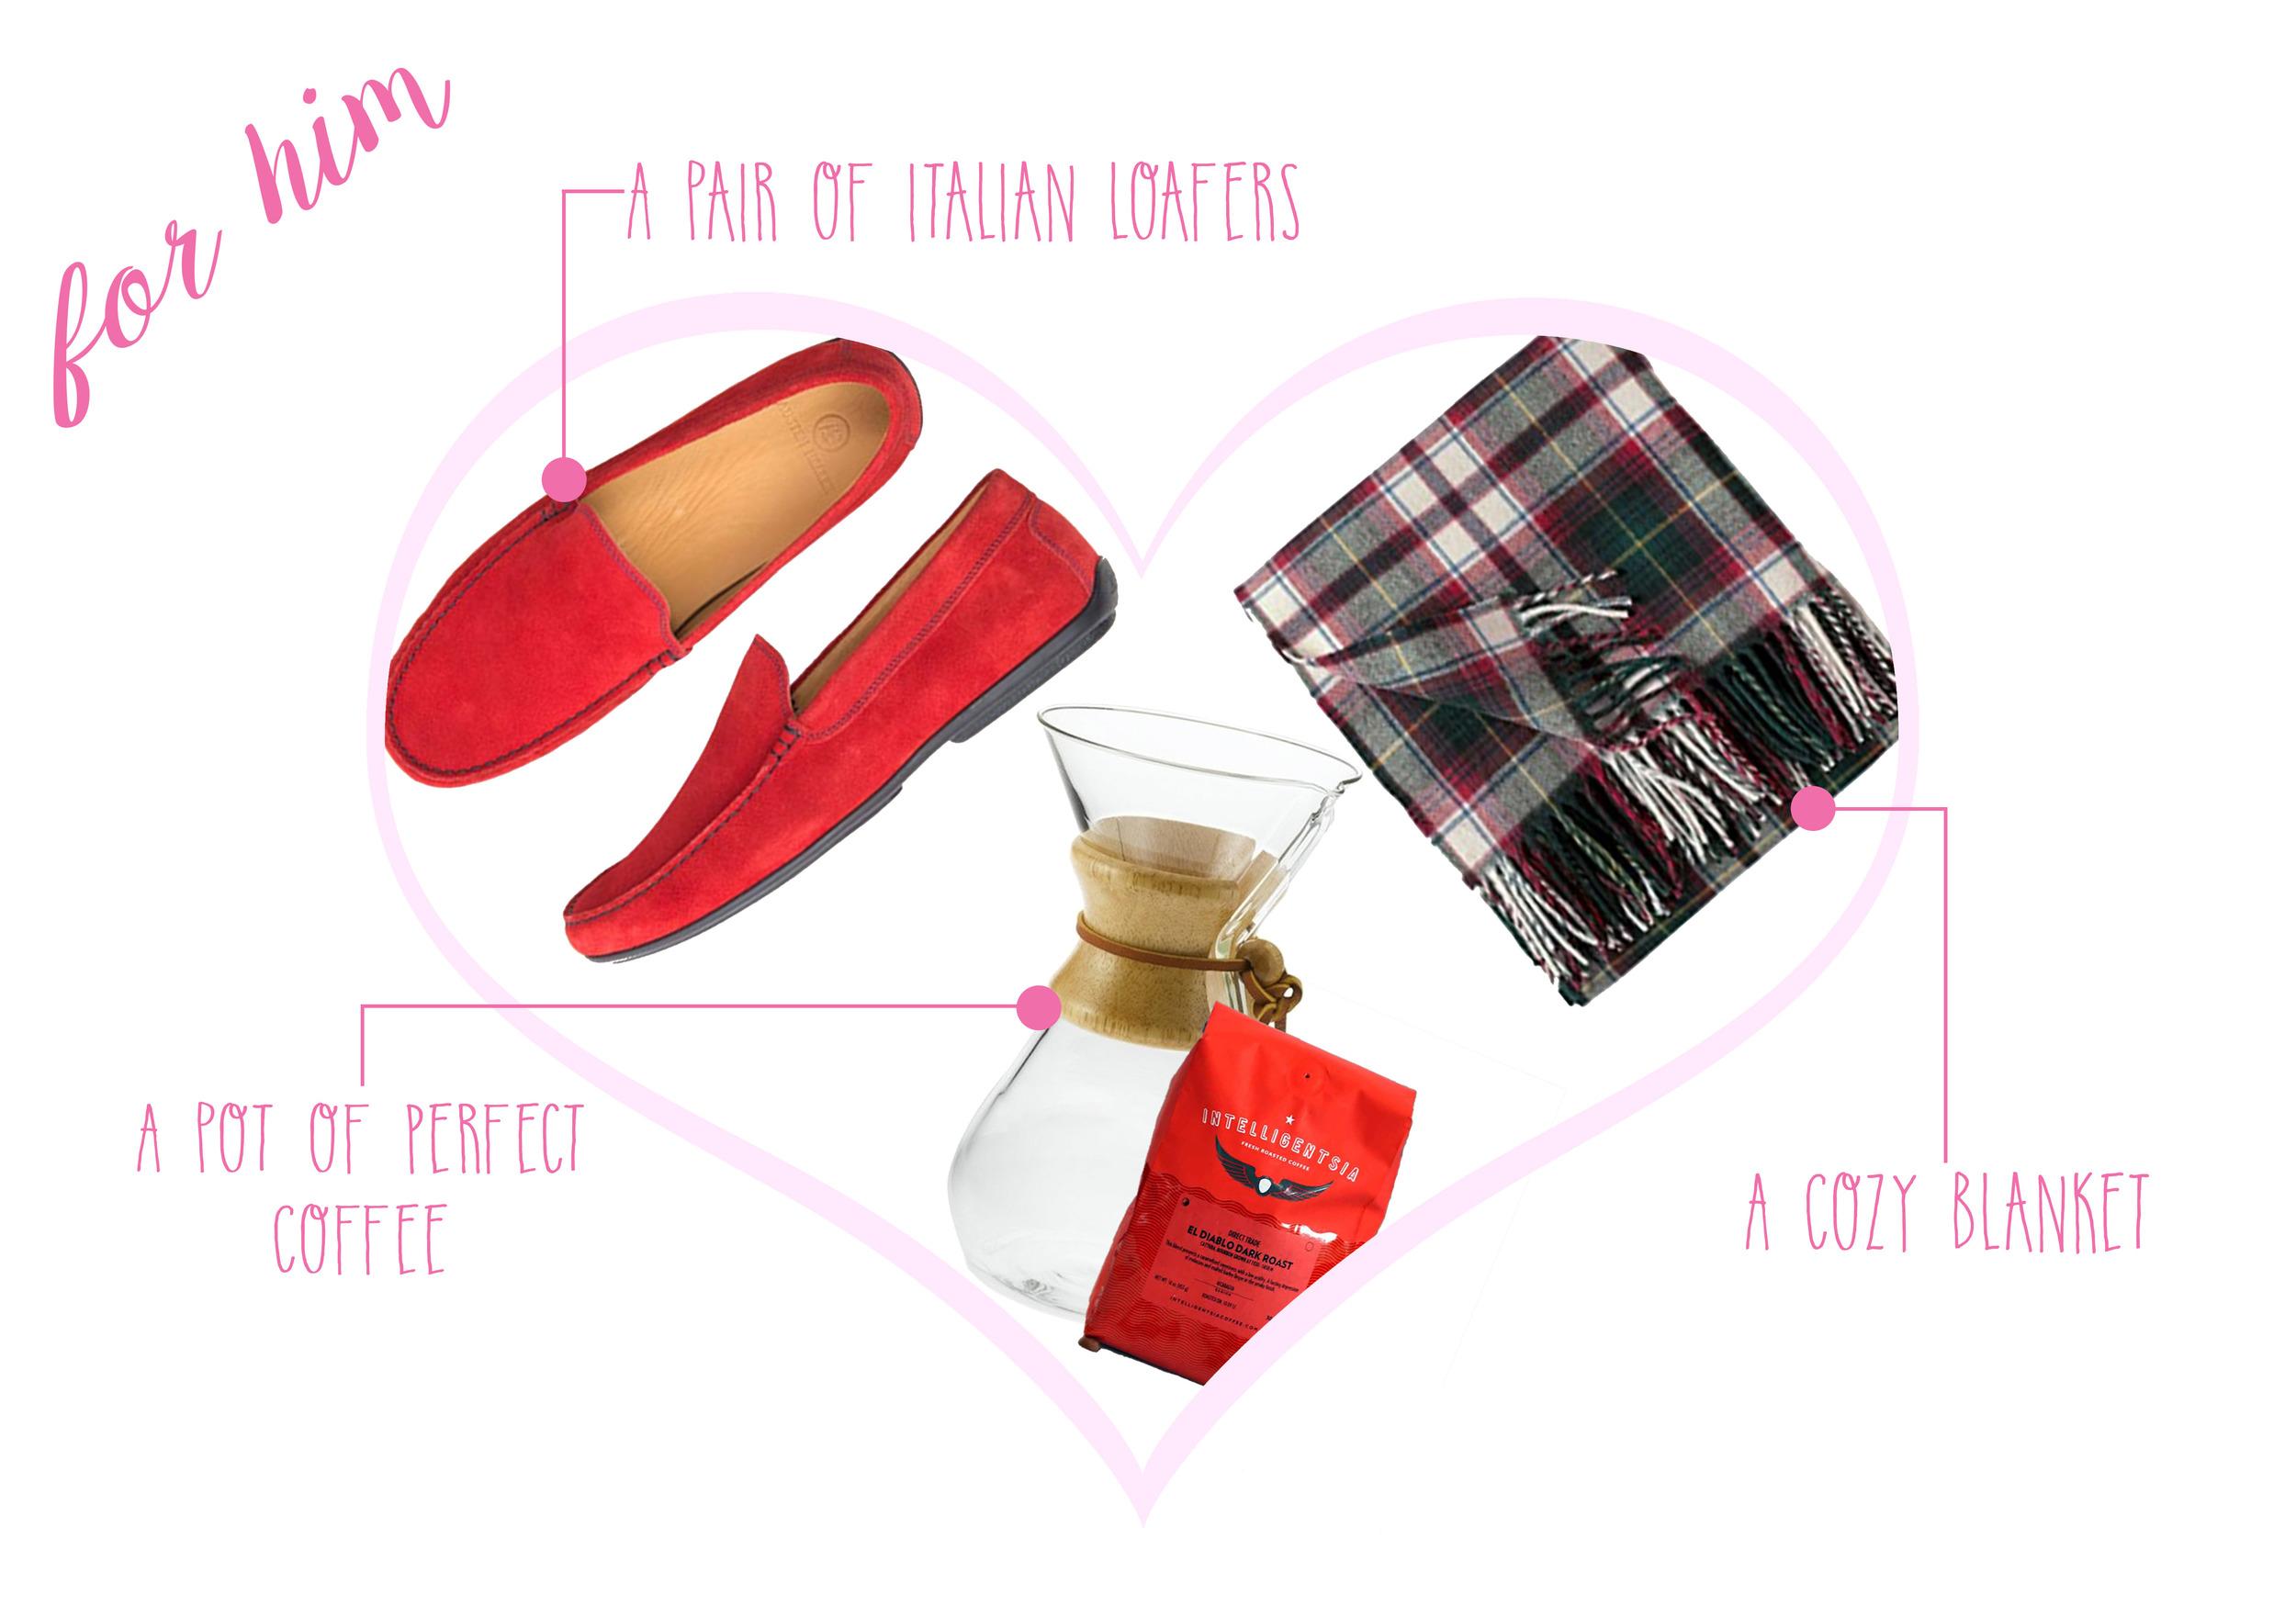 Austen Heller loafers  ($195) -  Chemex Glass Coffee Maker  ($35) -  Pendleton Merino Throw  ($129)